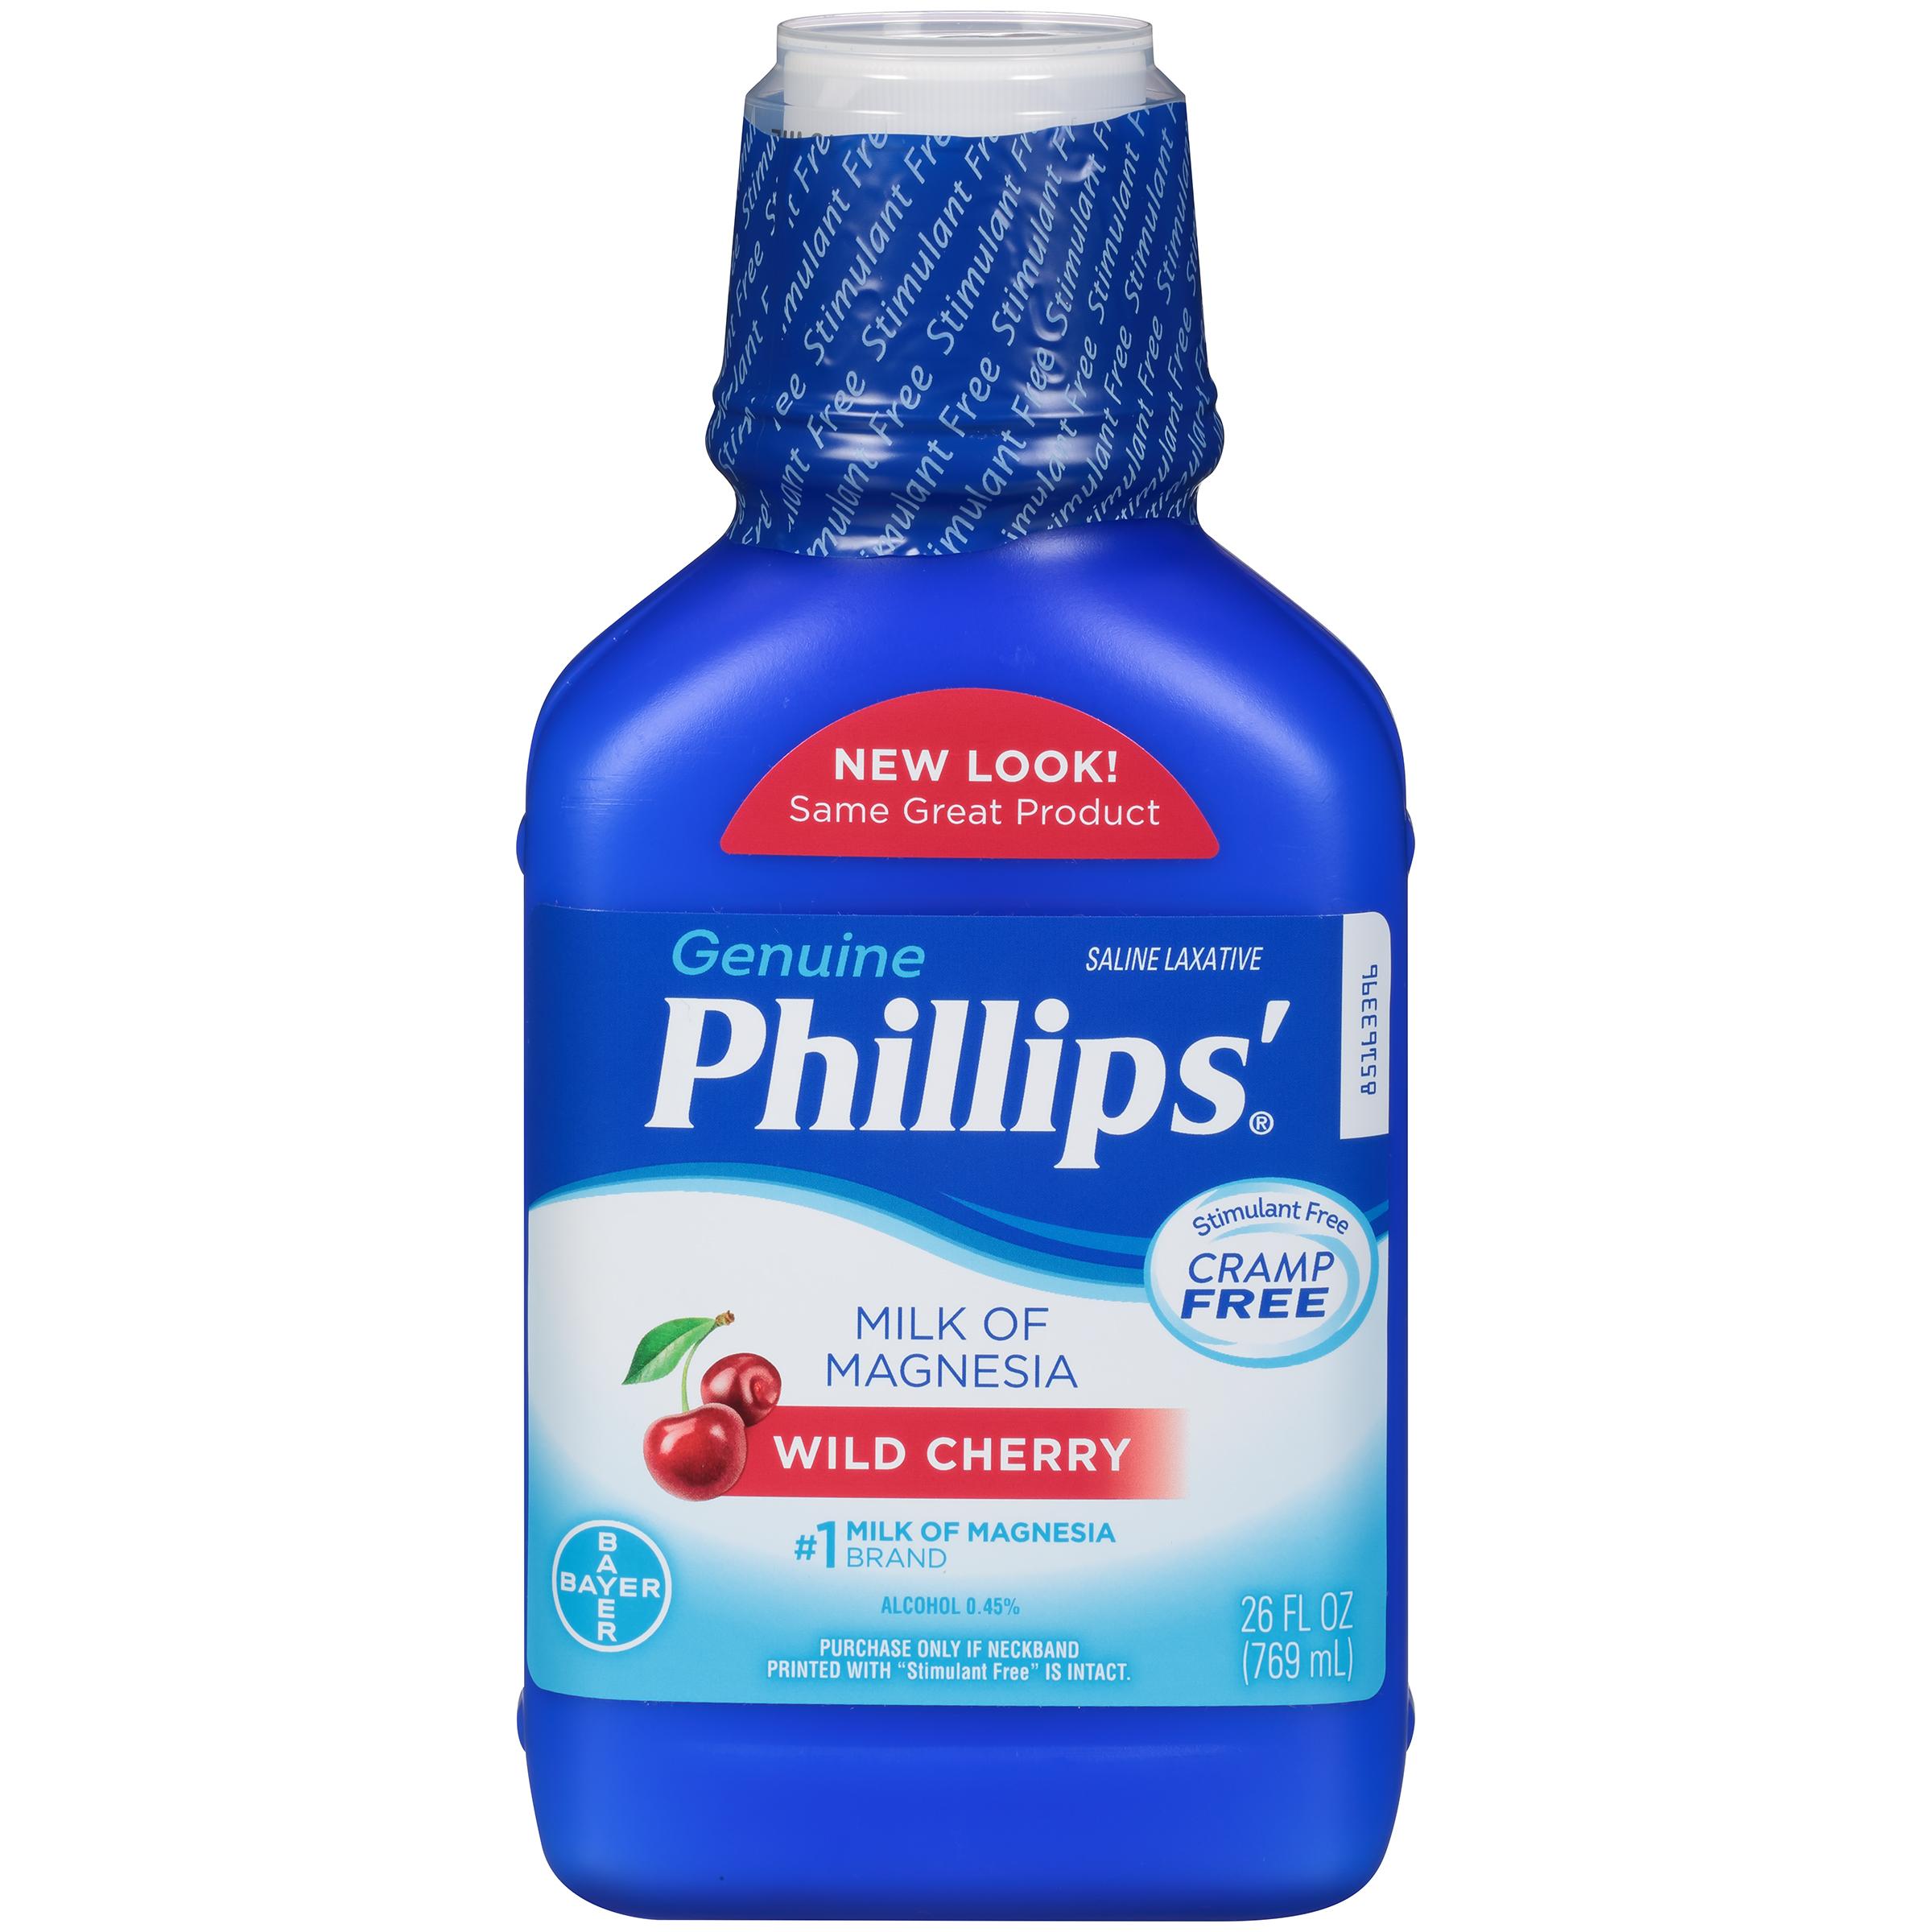 Phillips' Milk Of Magnesia Liquid Laxative, Wild Cherry, 26 Fl Oz